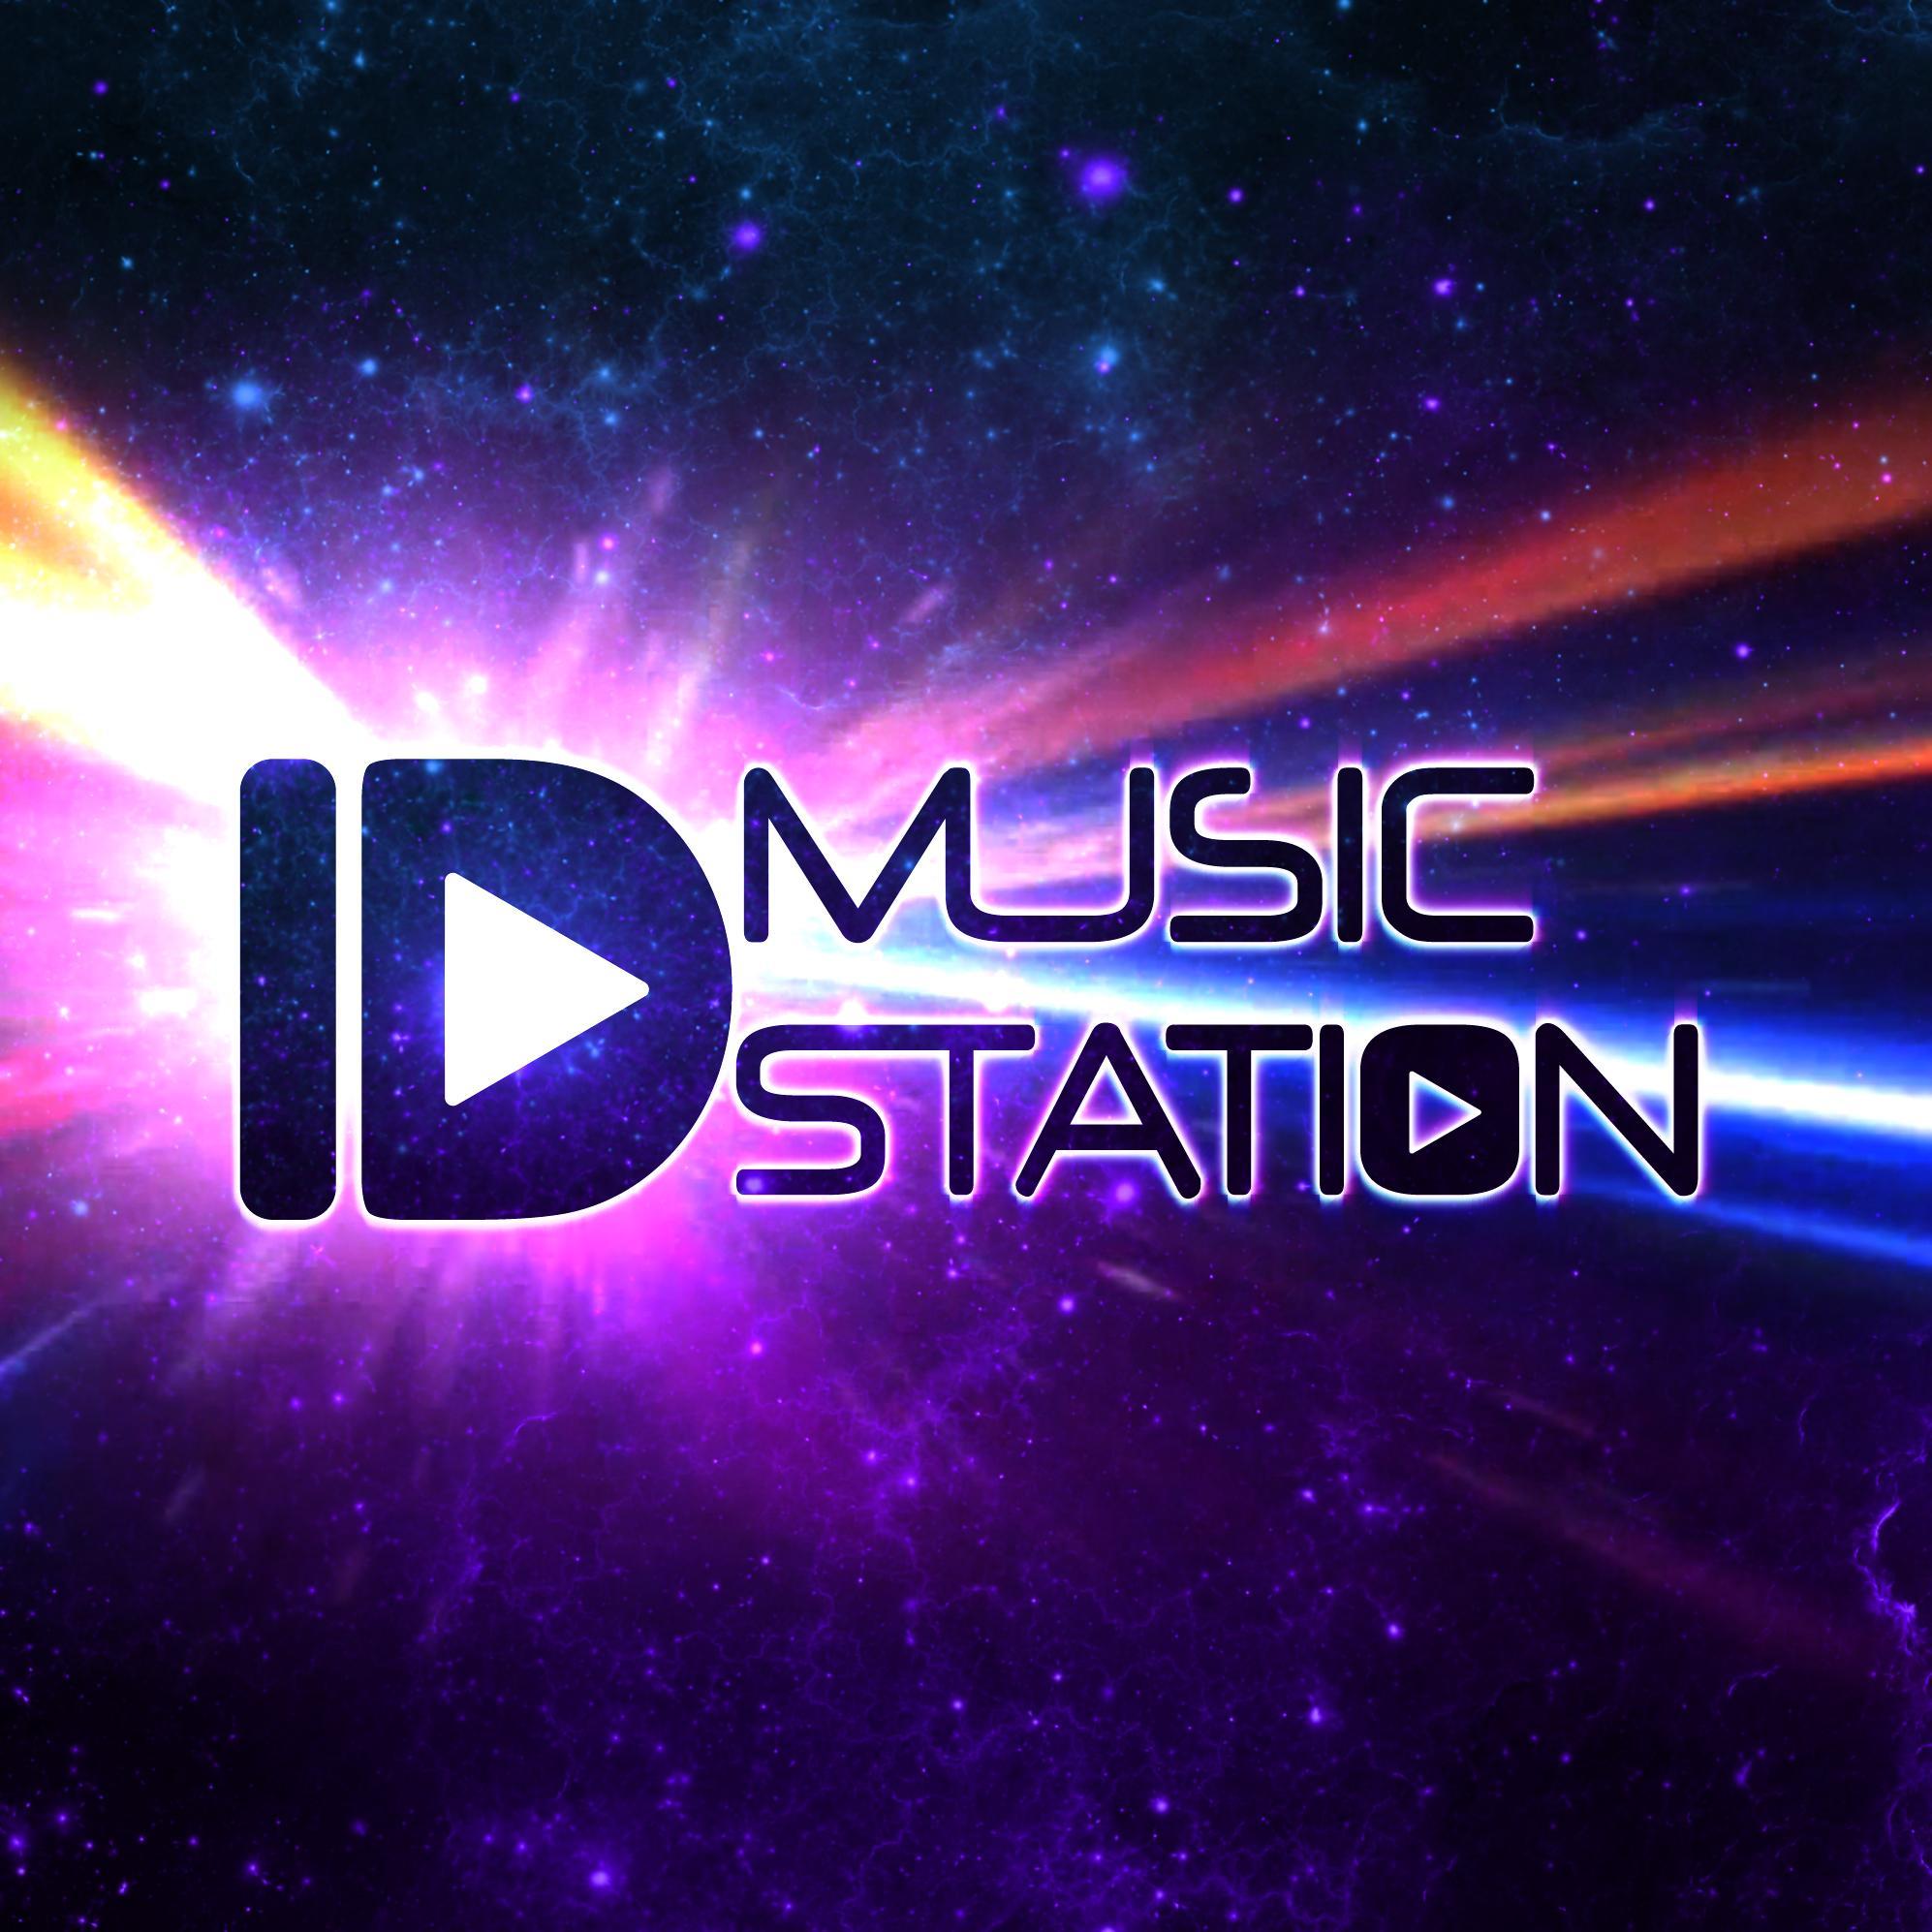 <![CDATA[IDMusic Station]]>